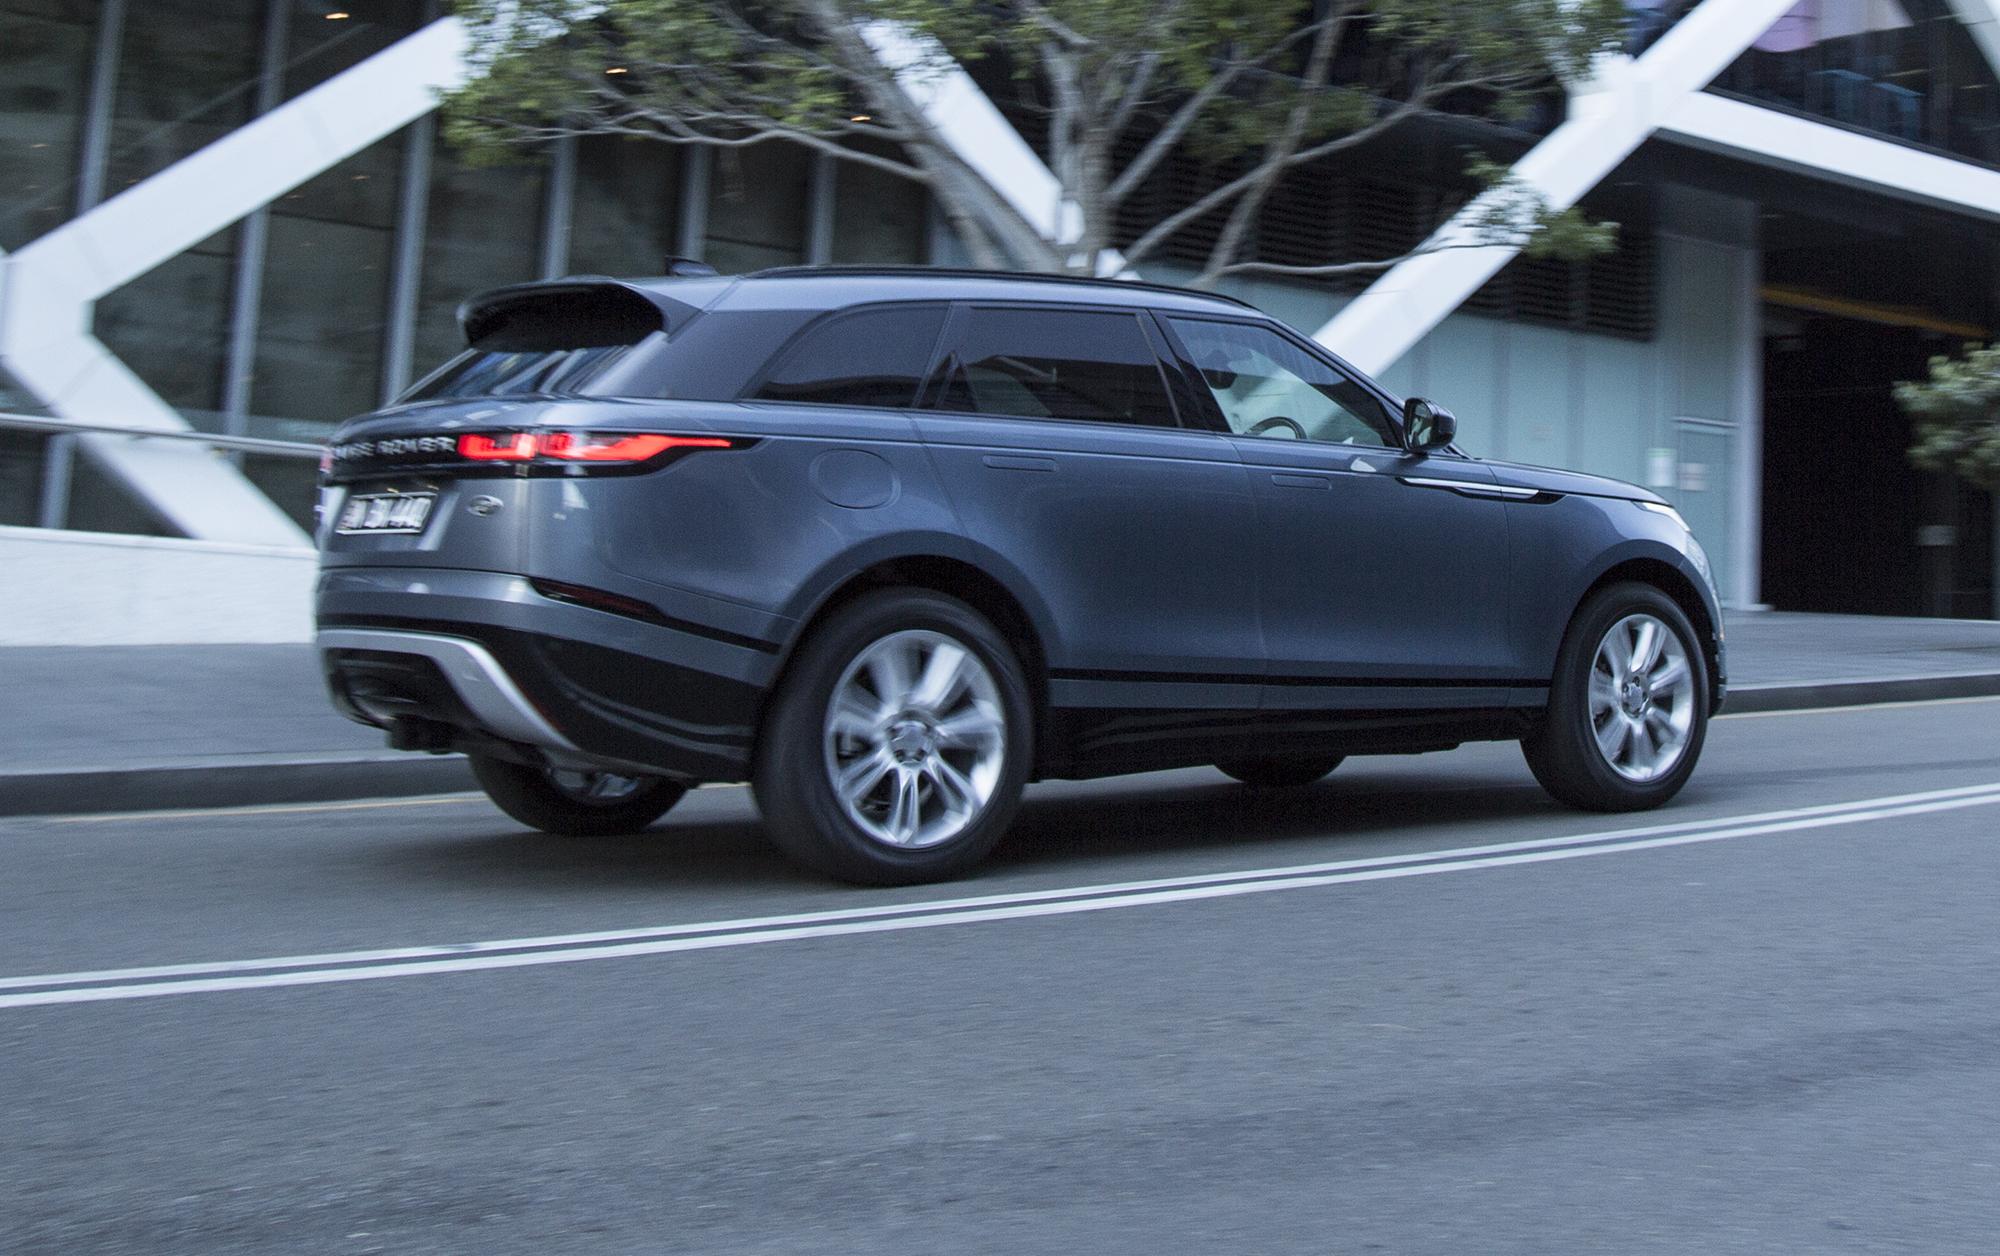 Range Rover Sport Svr 2018 >> 2018 Range Rover Velar SE D240 diesel review - photos | CarAdvice